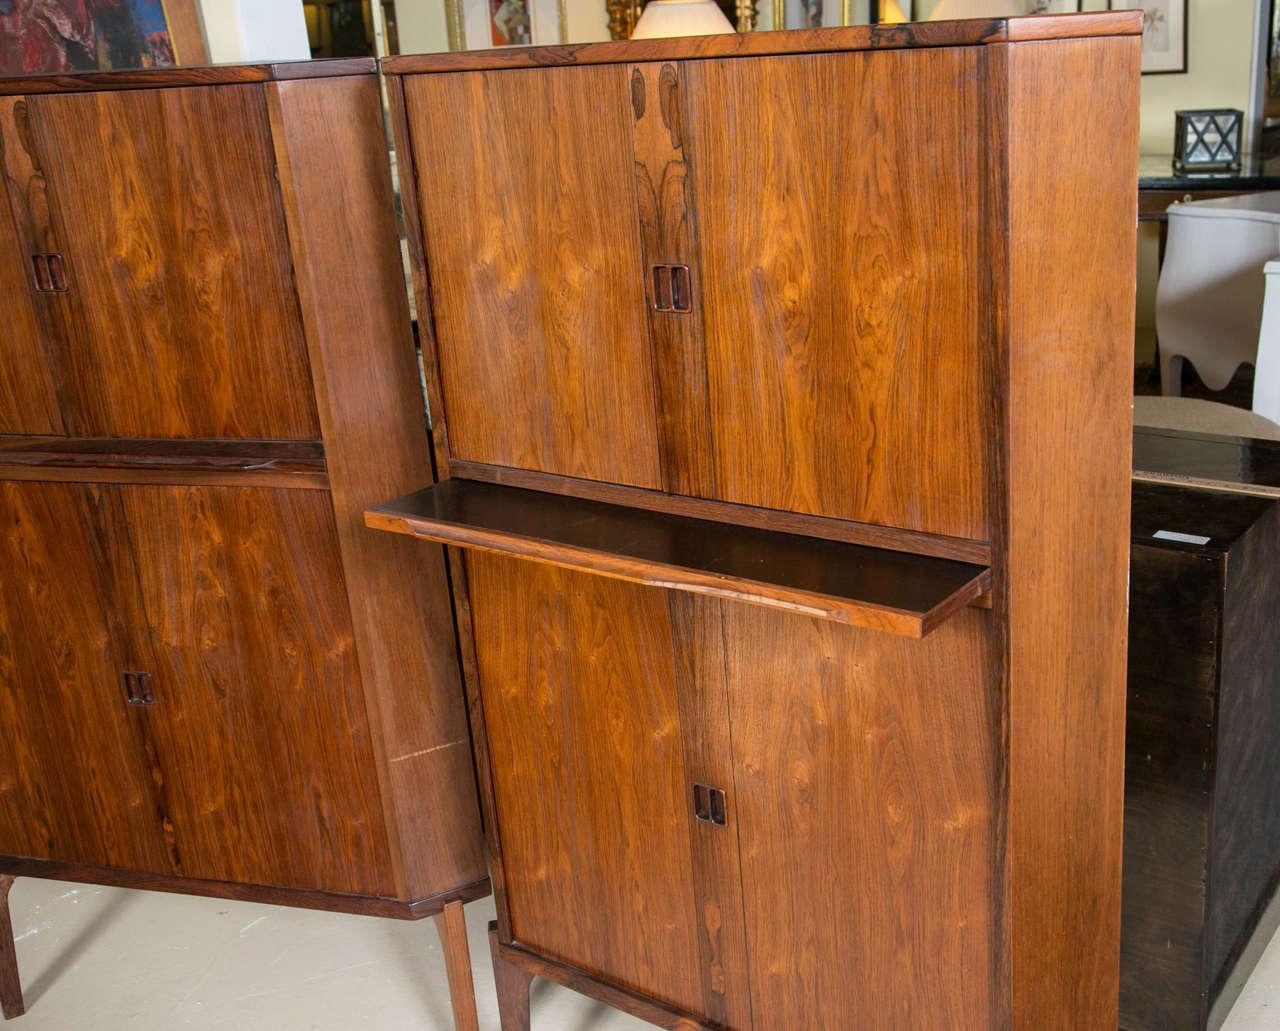 Mid Century Corner Cabinet: Pair Of Mid-Century Modern Danish Rosewood Corner Cabinets